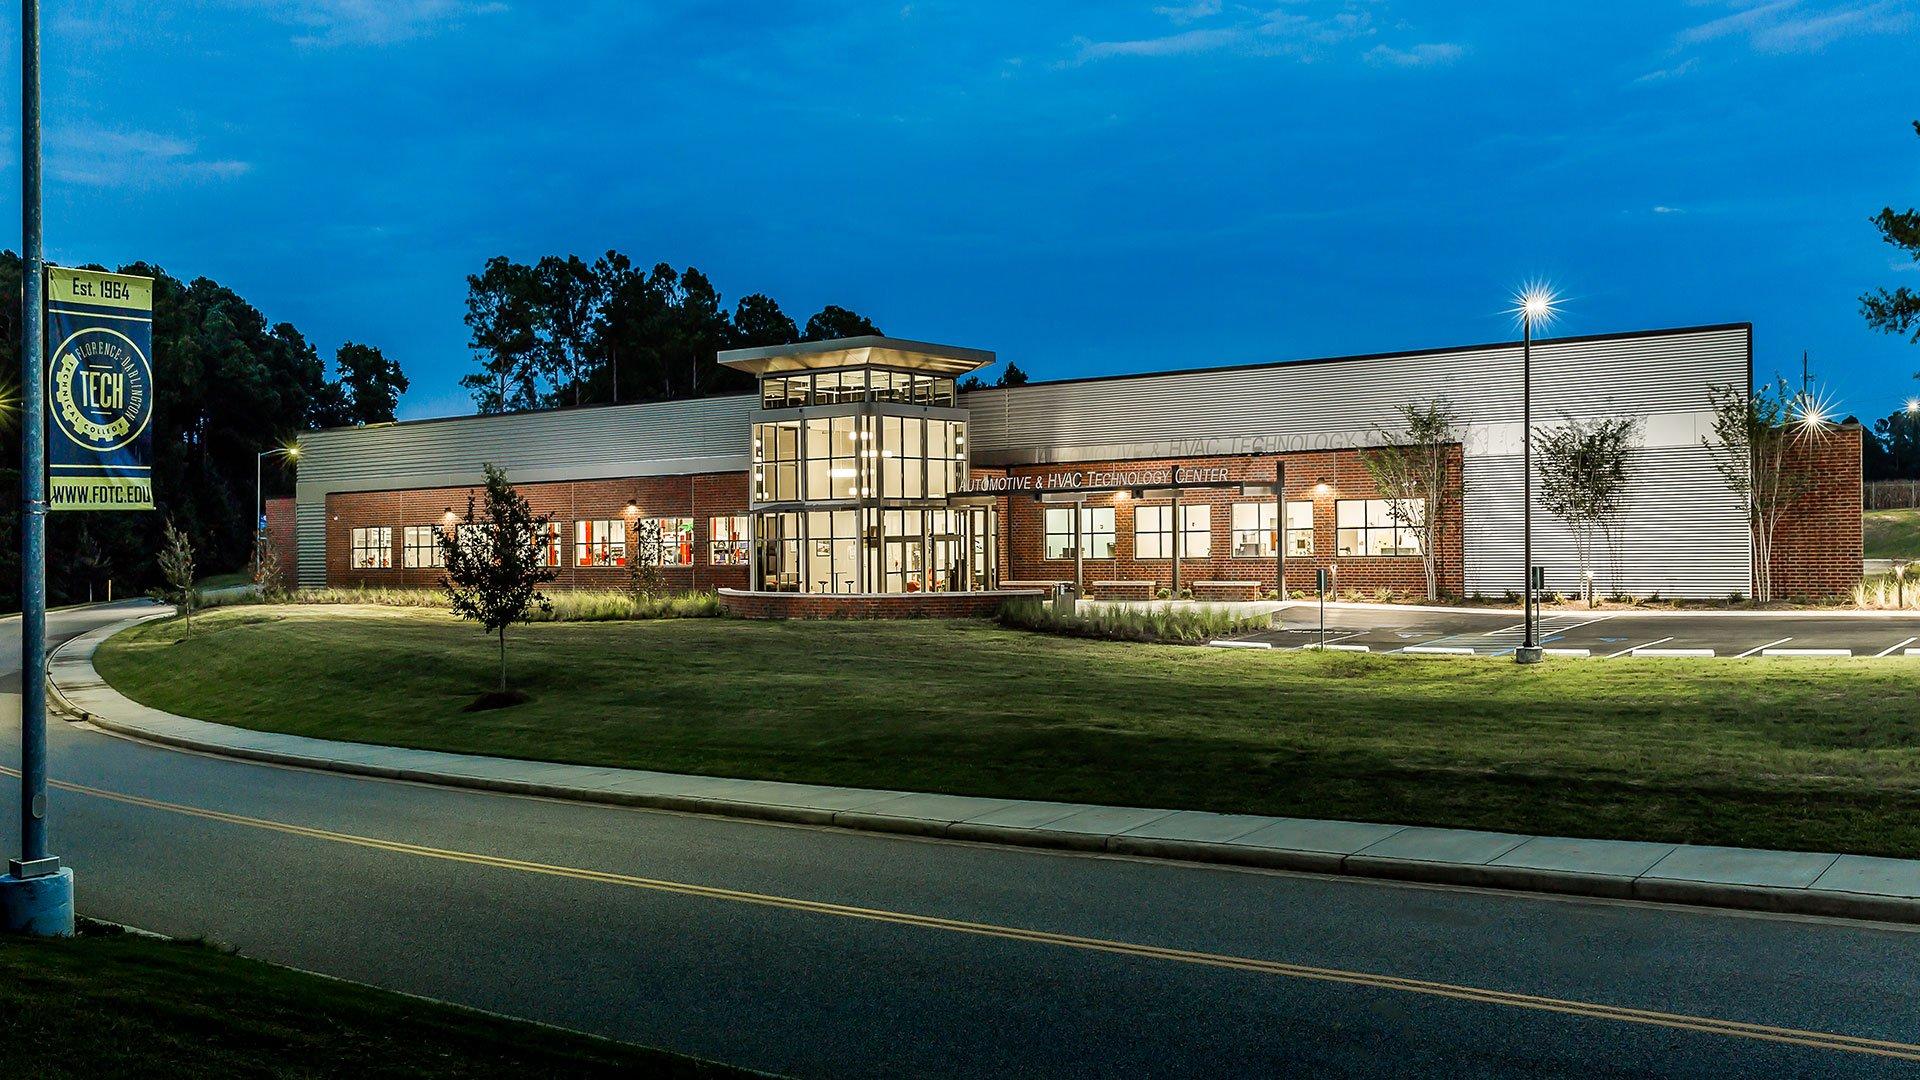 Florence-Darlington Technical College, Automotive and HVAC Technology Center